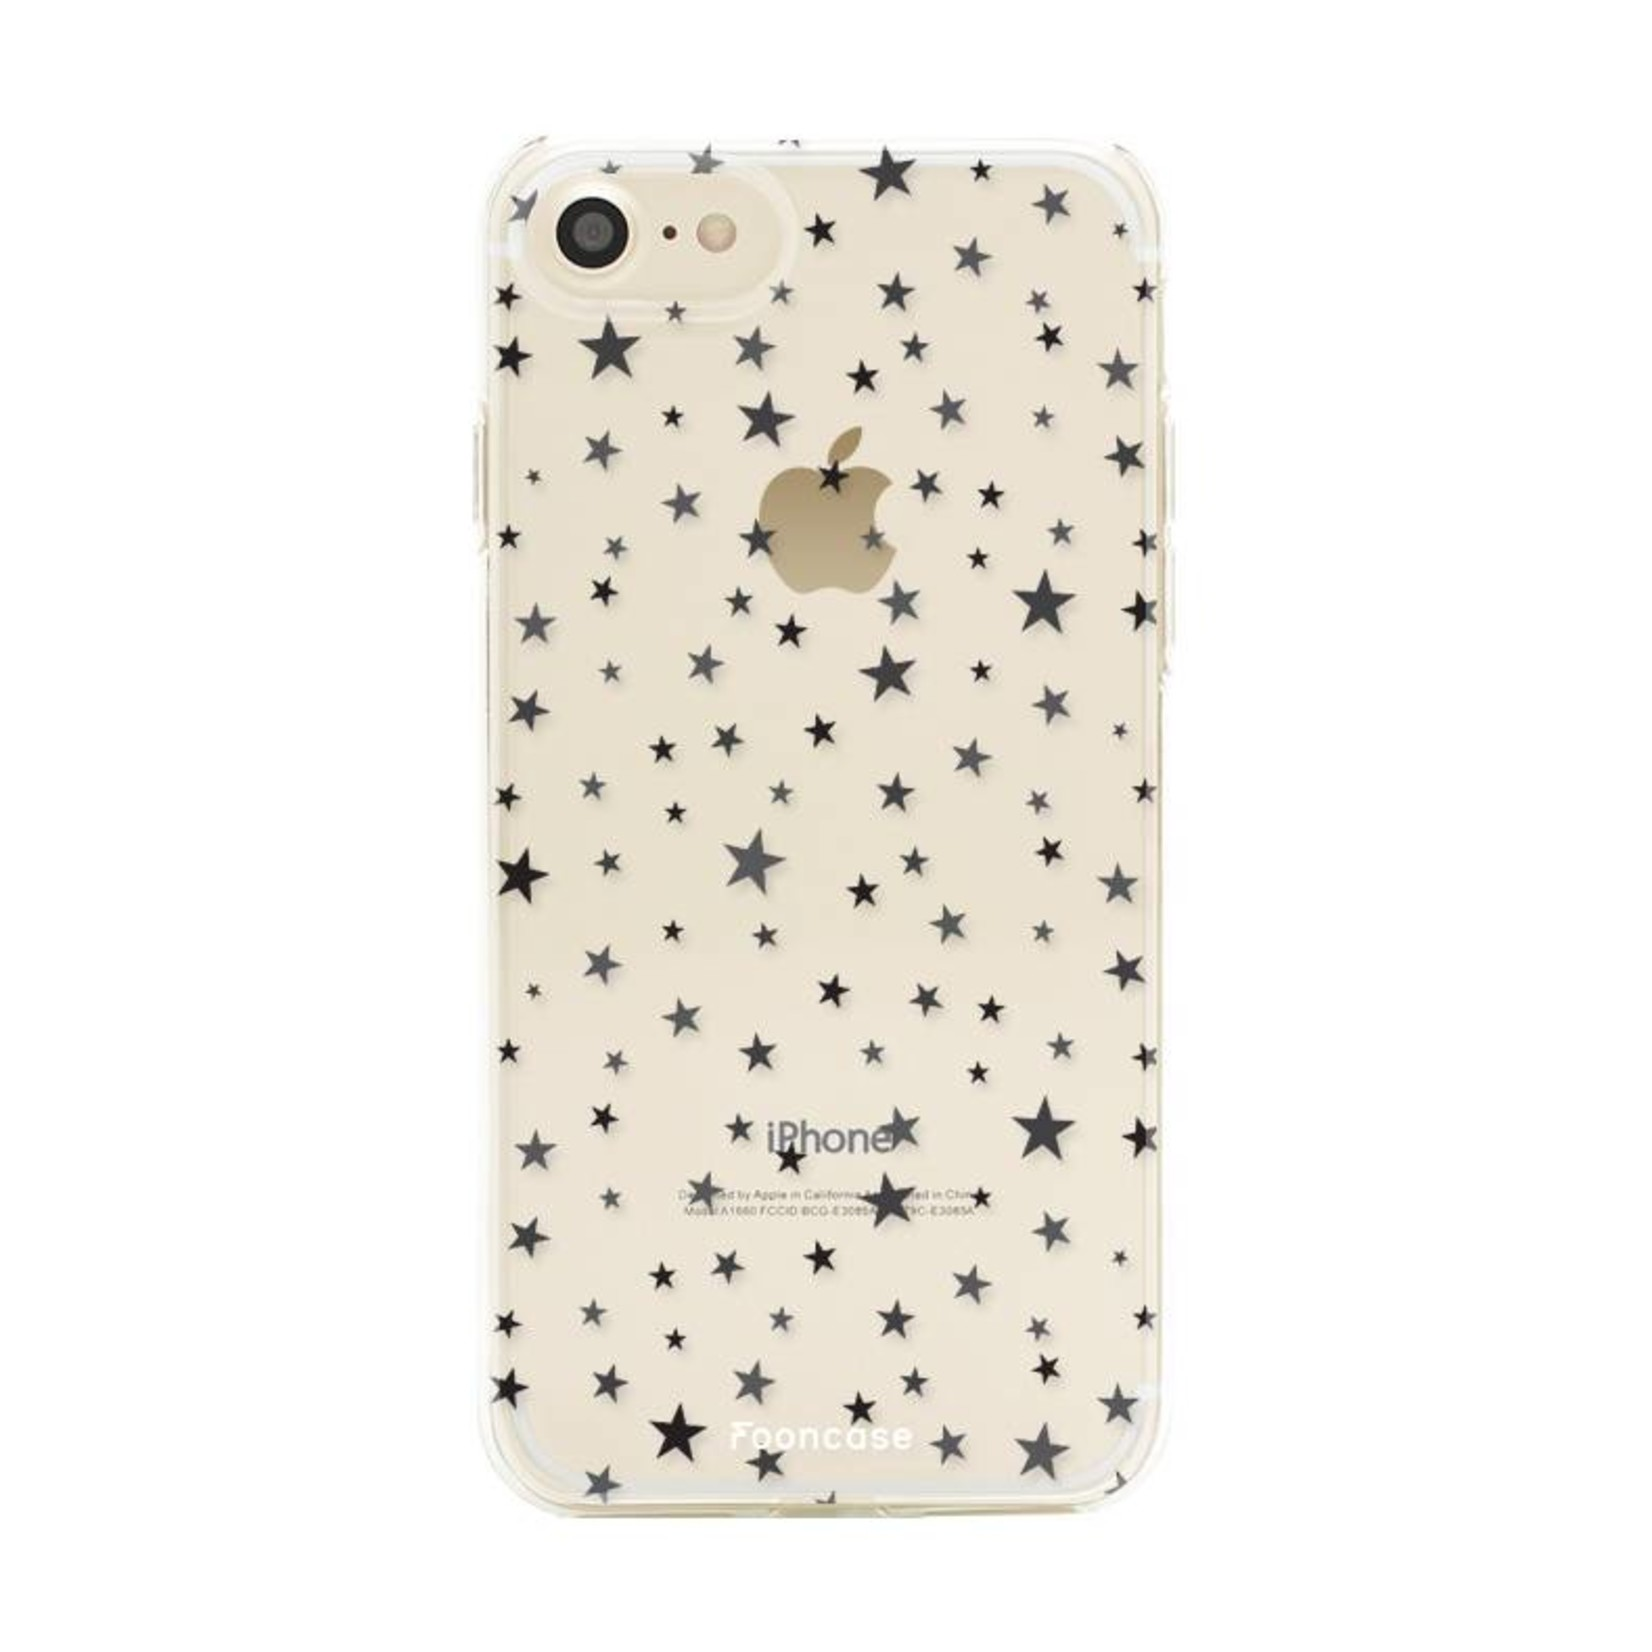 FOONCASE iPhone SE (2020) hoesje TPU Soft Case - Back Cover - Stars / Sterretjes